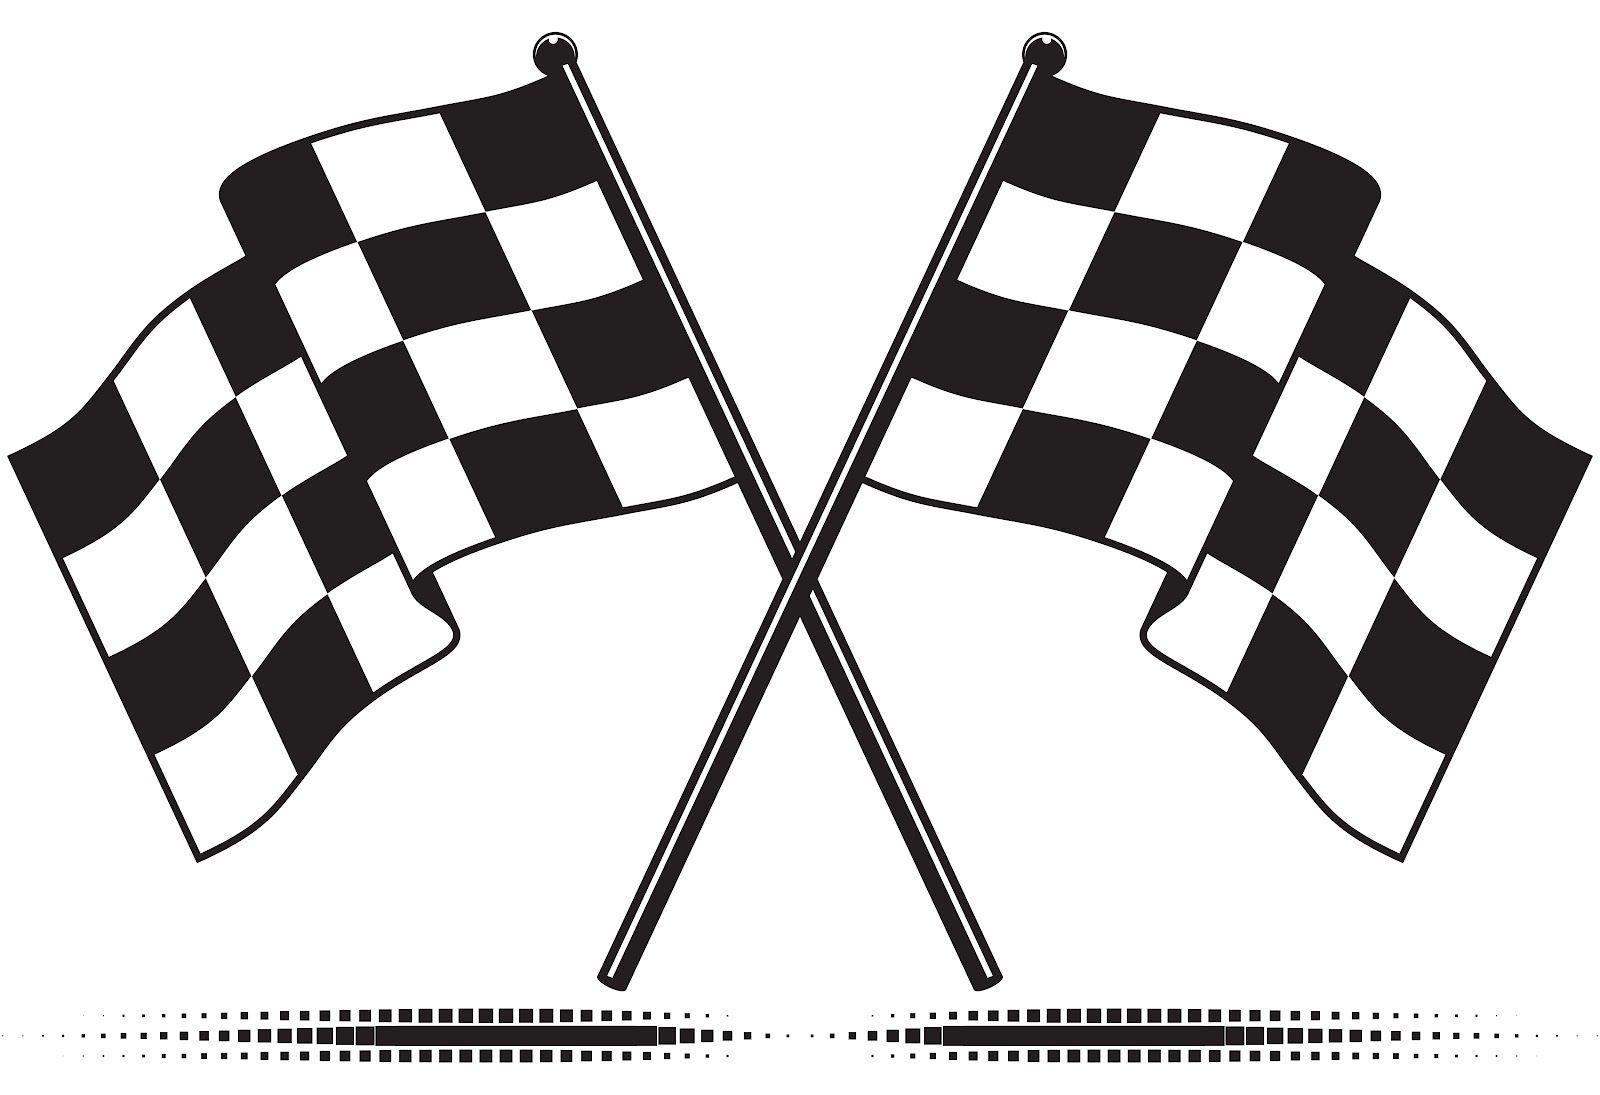 Pin By Melissa Matz On Stephen Checkered Flag Checkered Flag